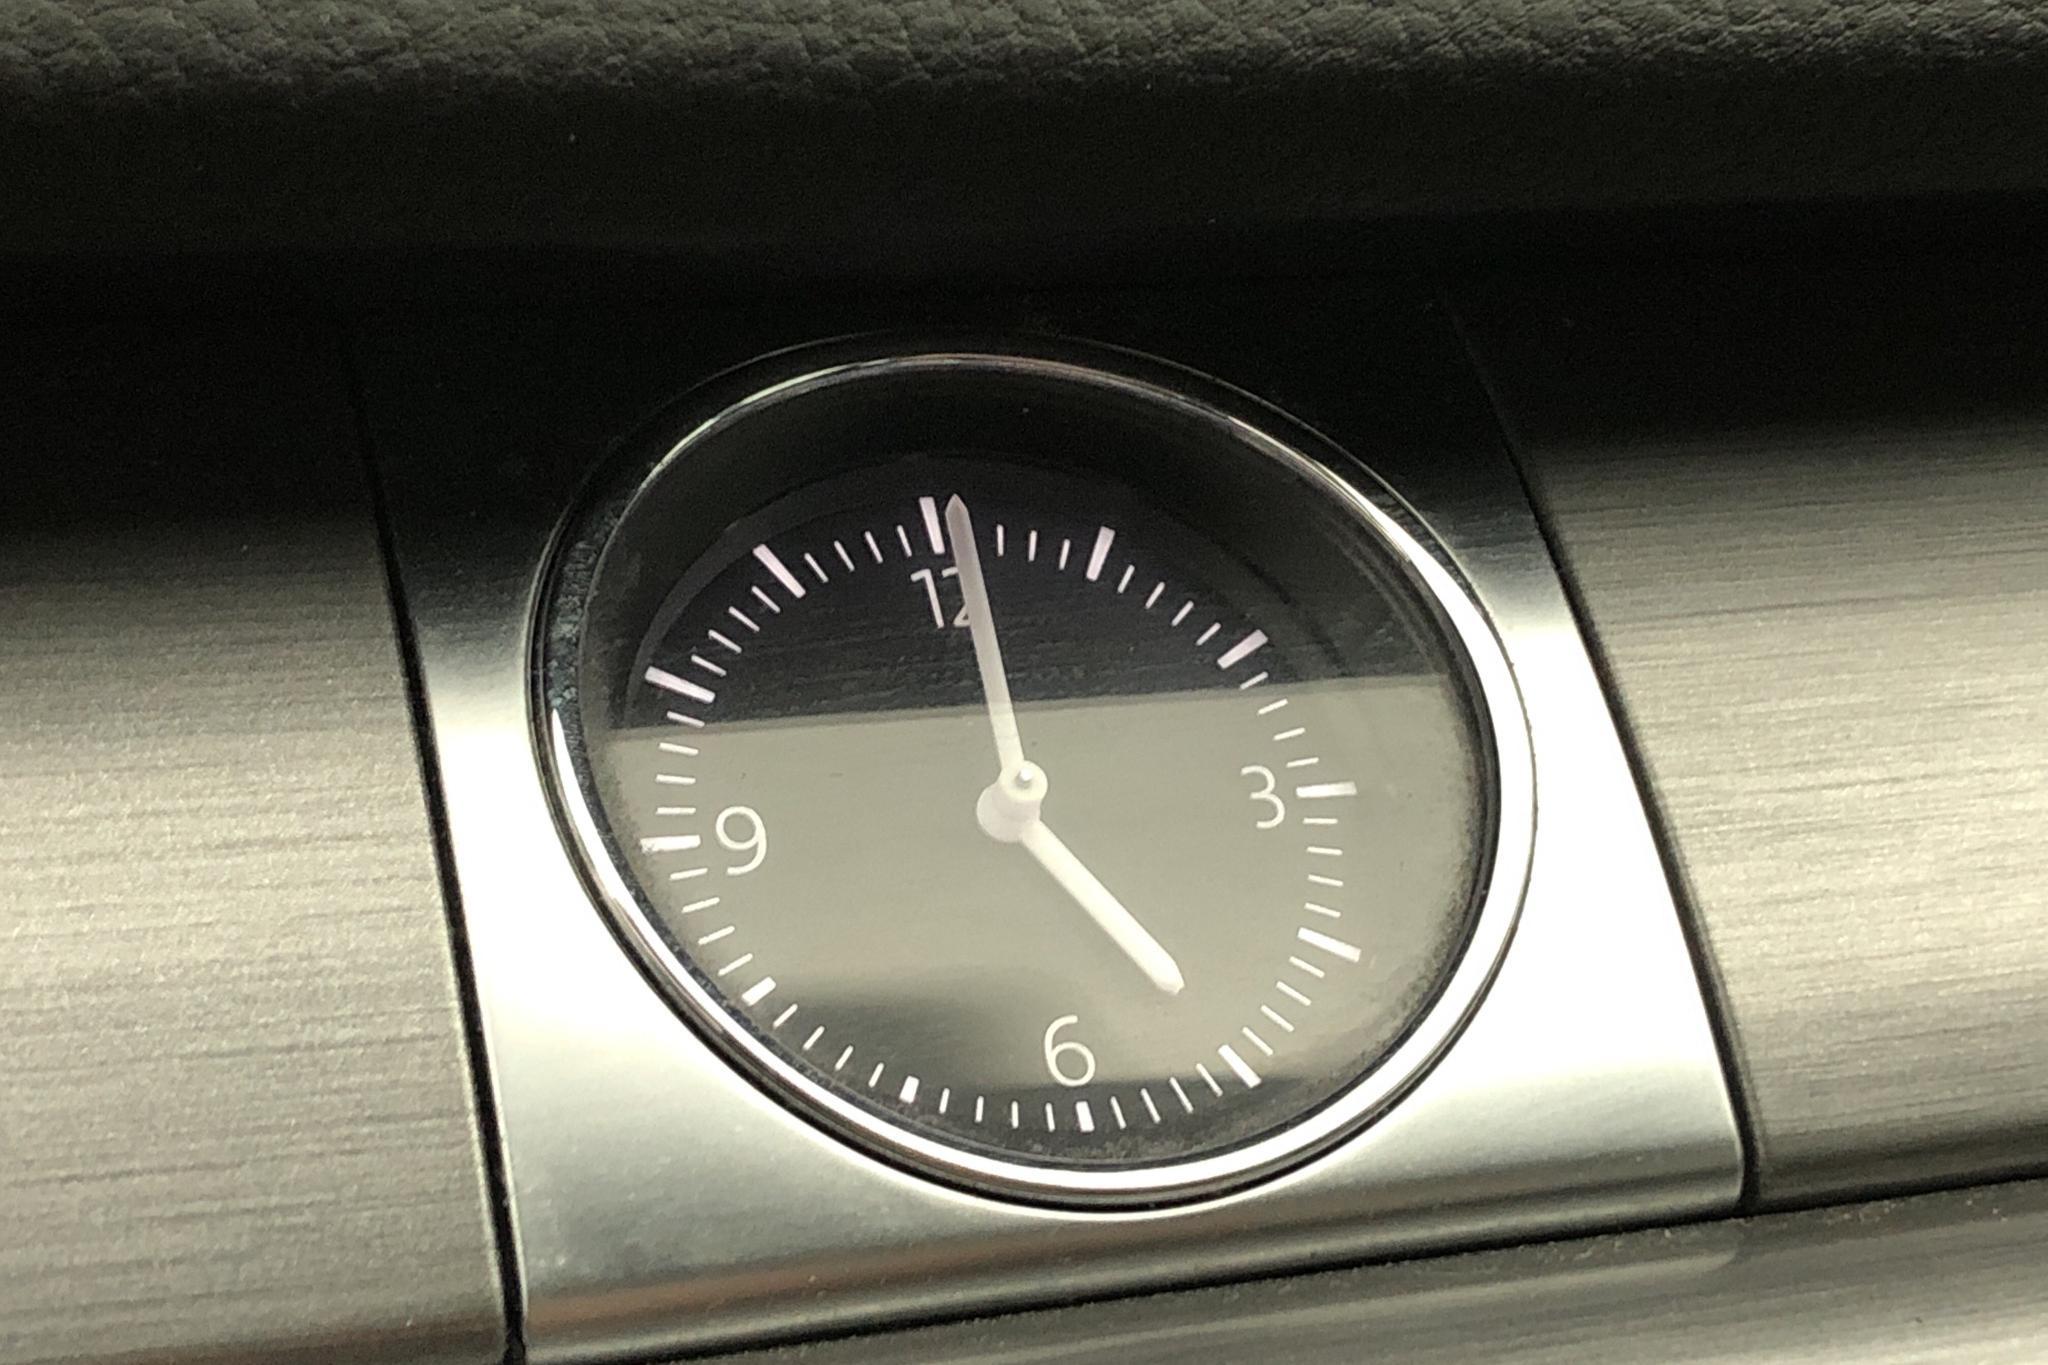 VW Passat 2.0 TDI BlueMotion Technology Variant 4Motion (140hk) - 18 253 mil - Manuell - vit - 2011